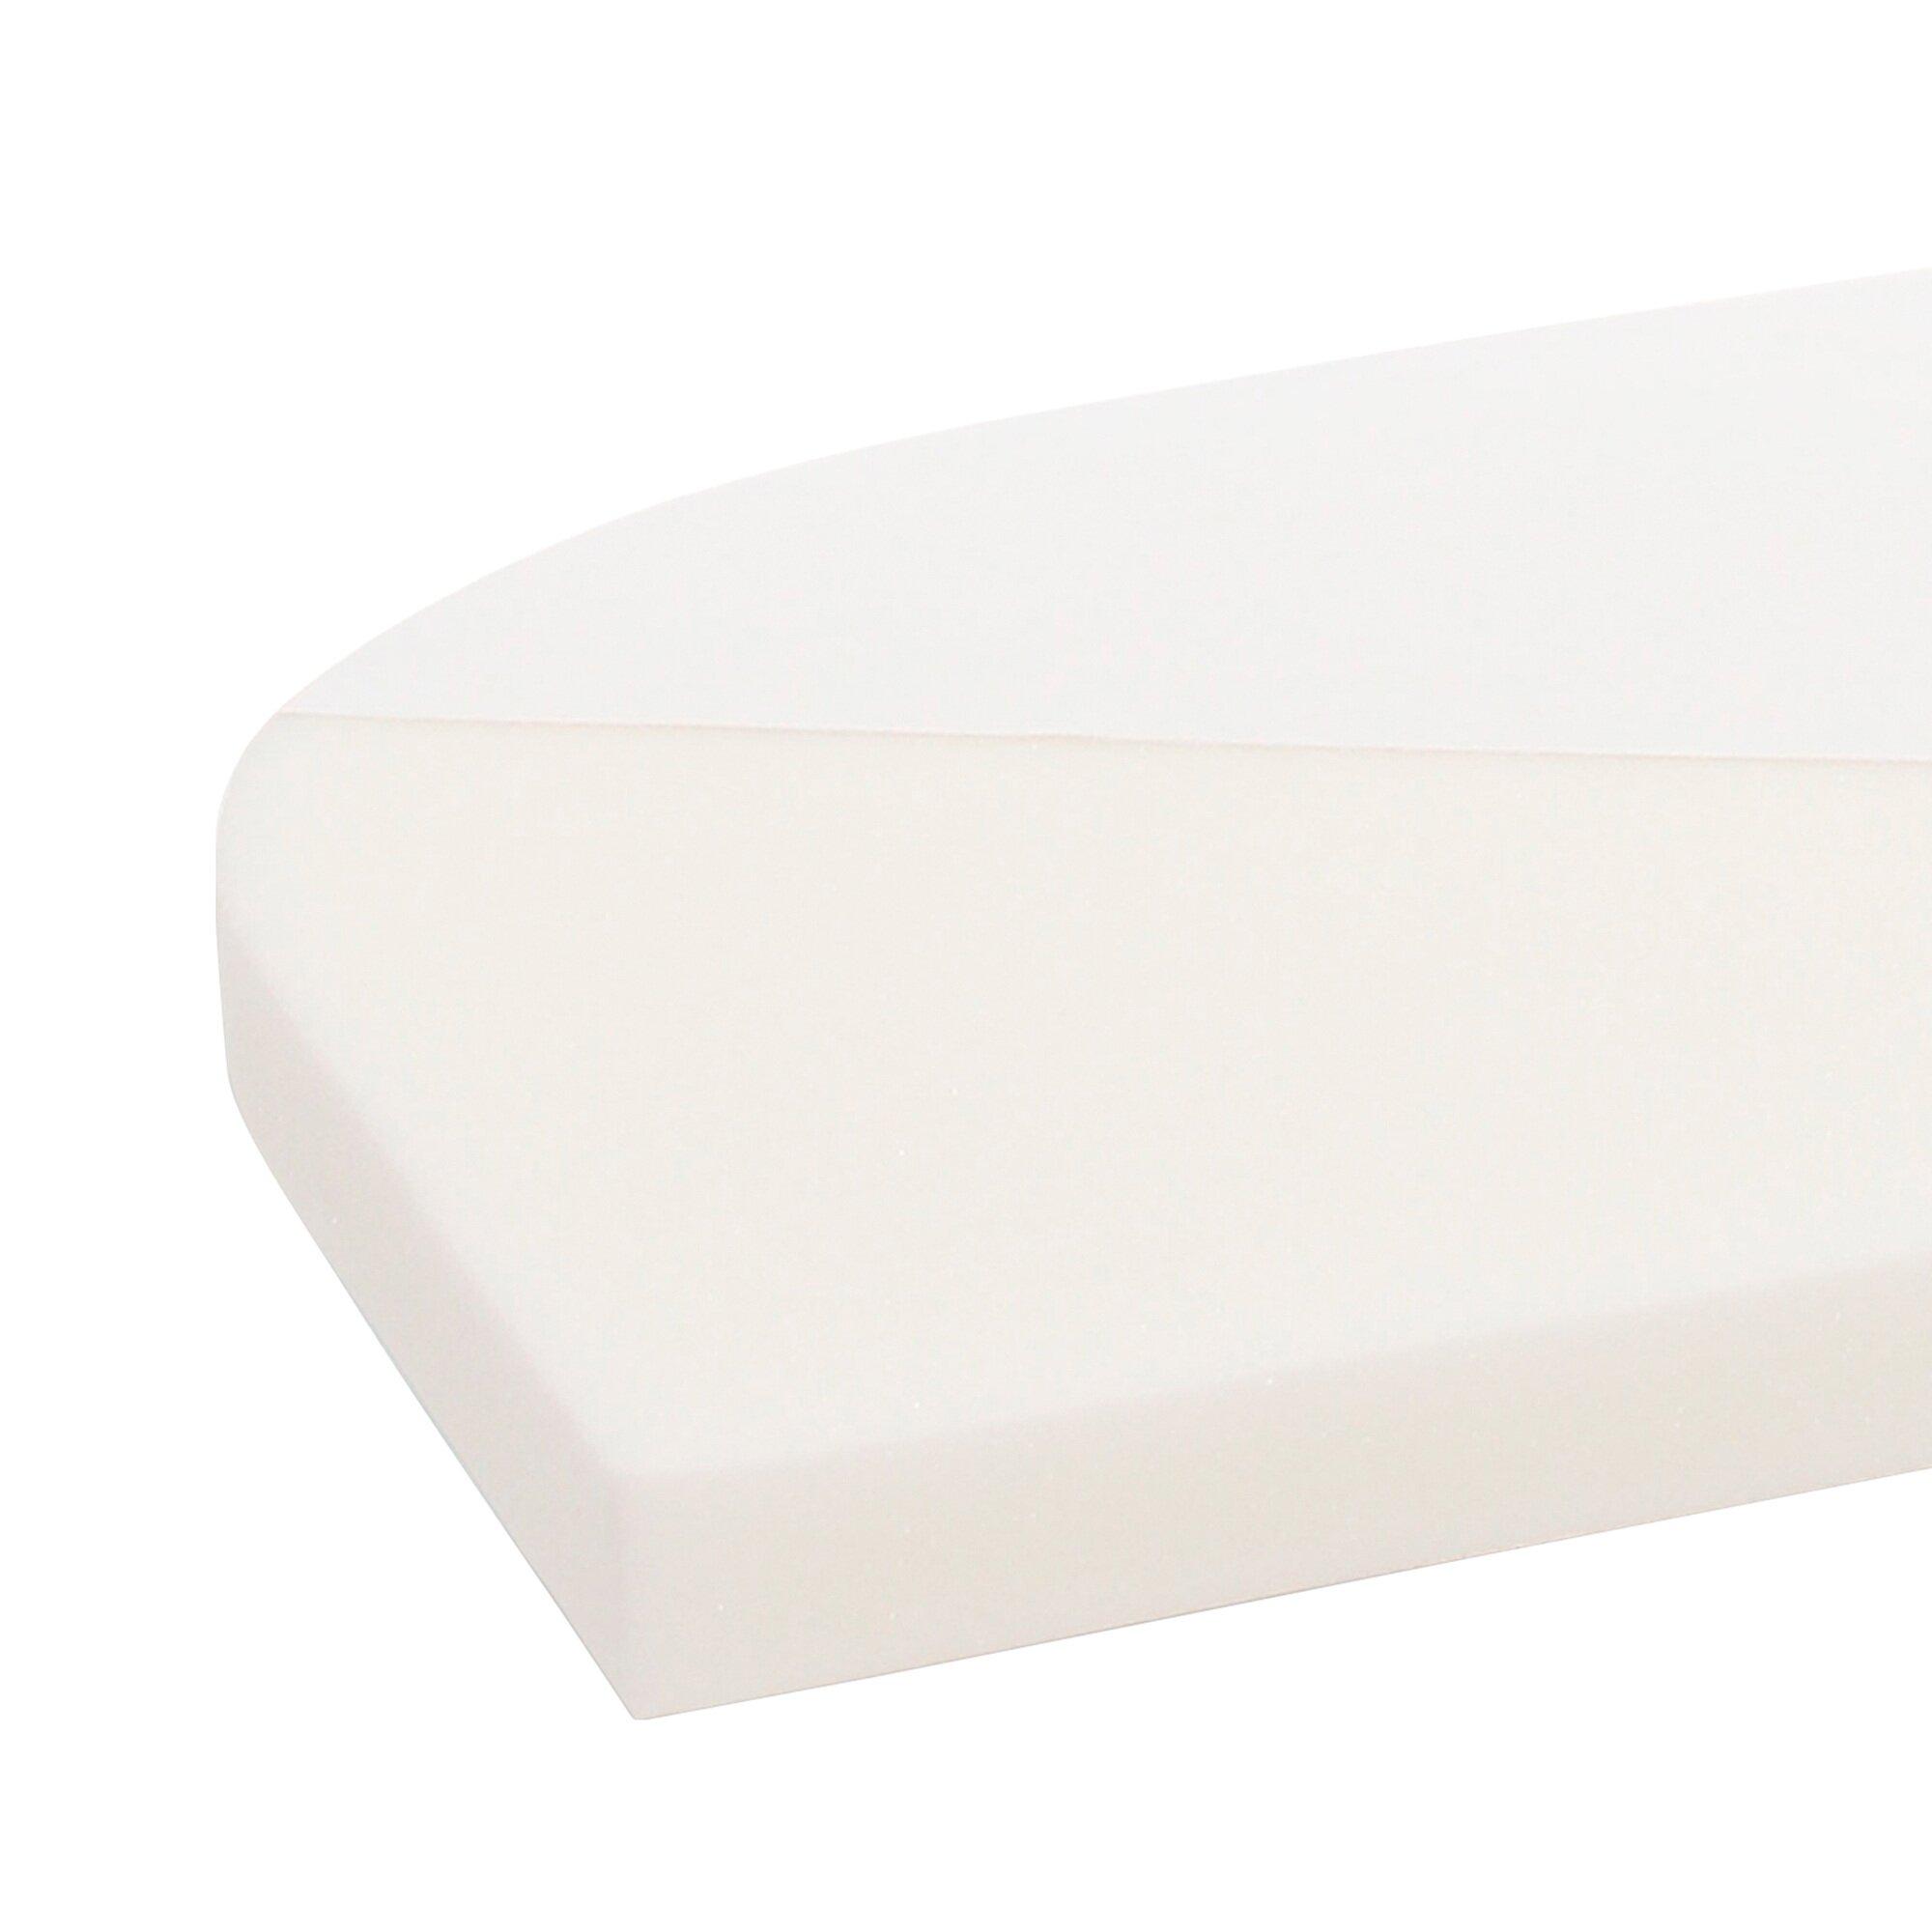 babybay-beistellbett-matratze-original-classic-81x43-cm-weiss